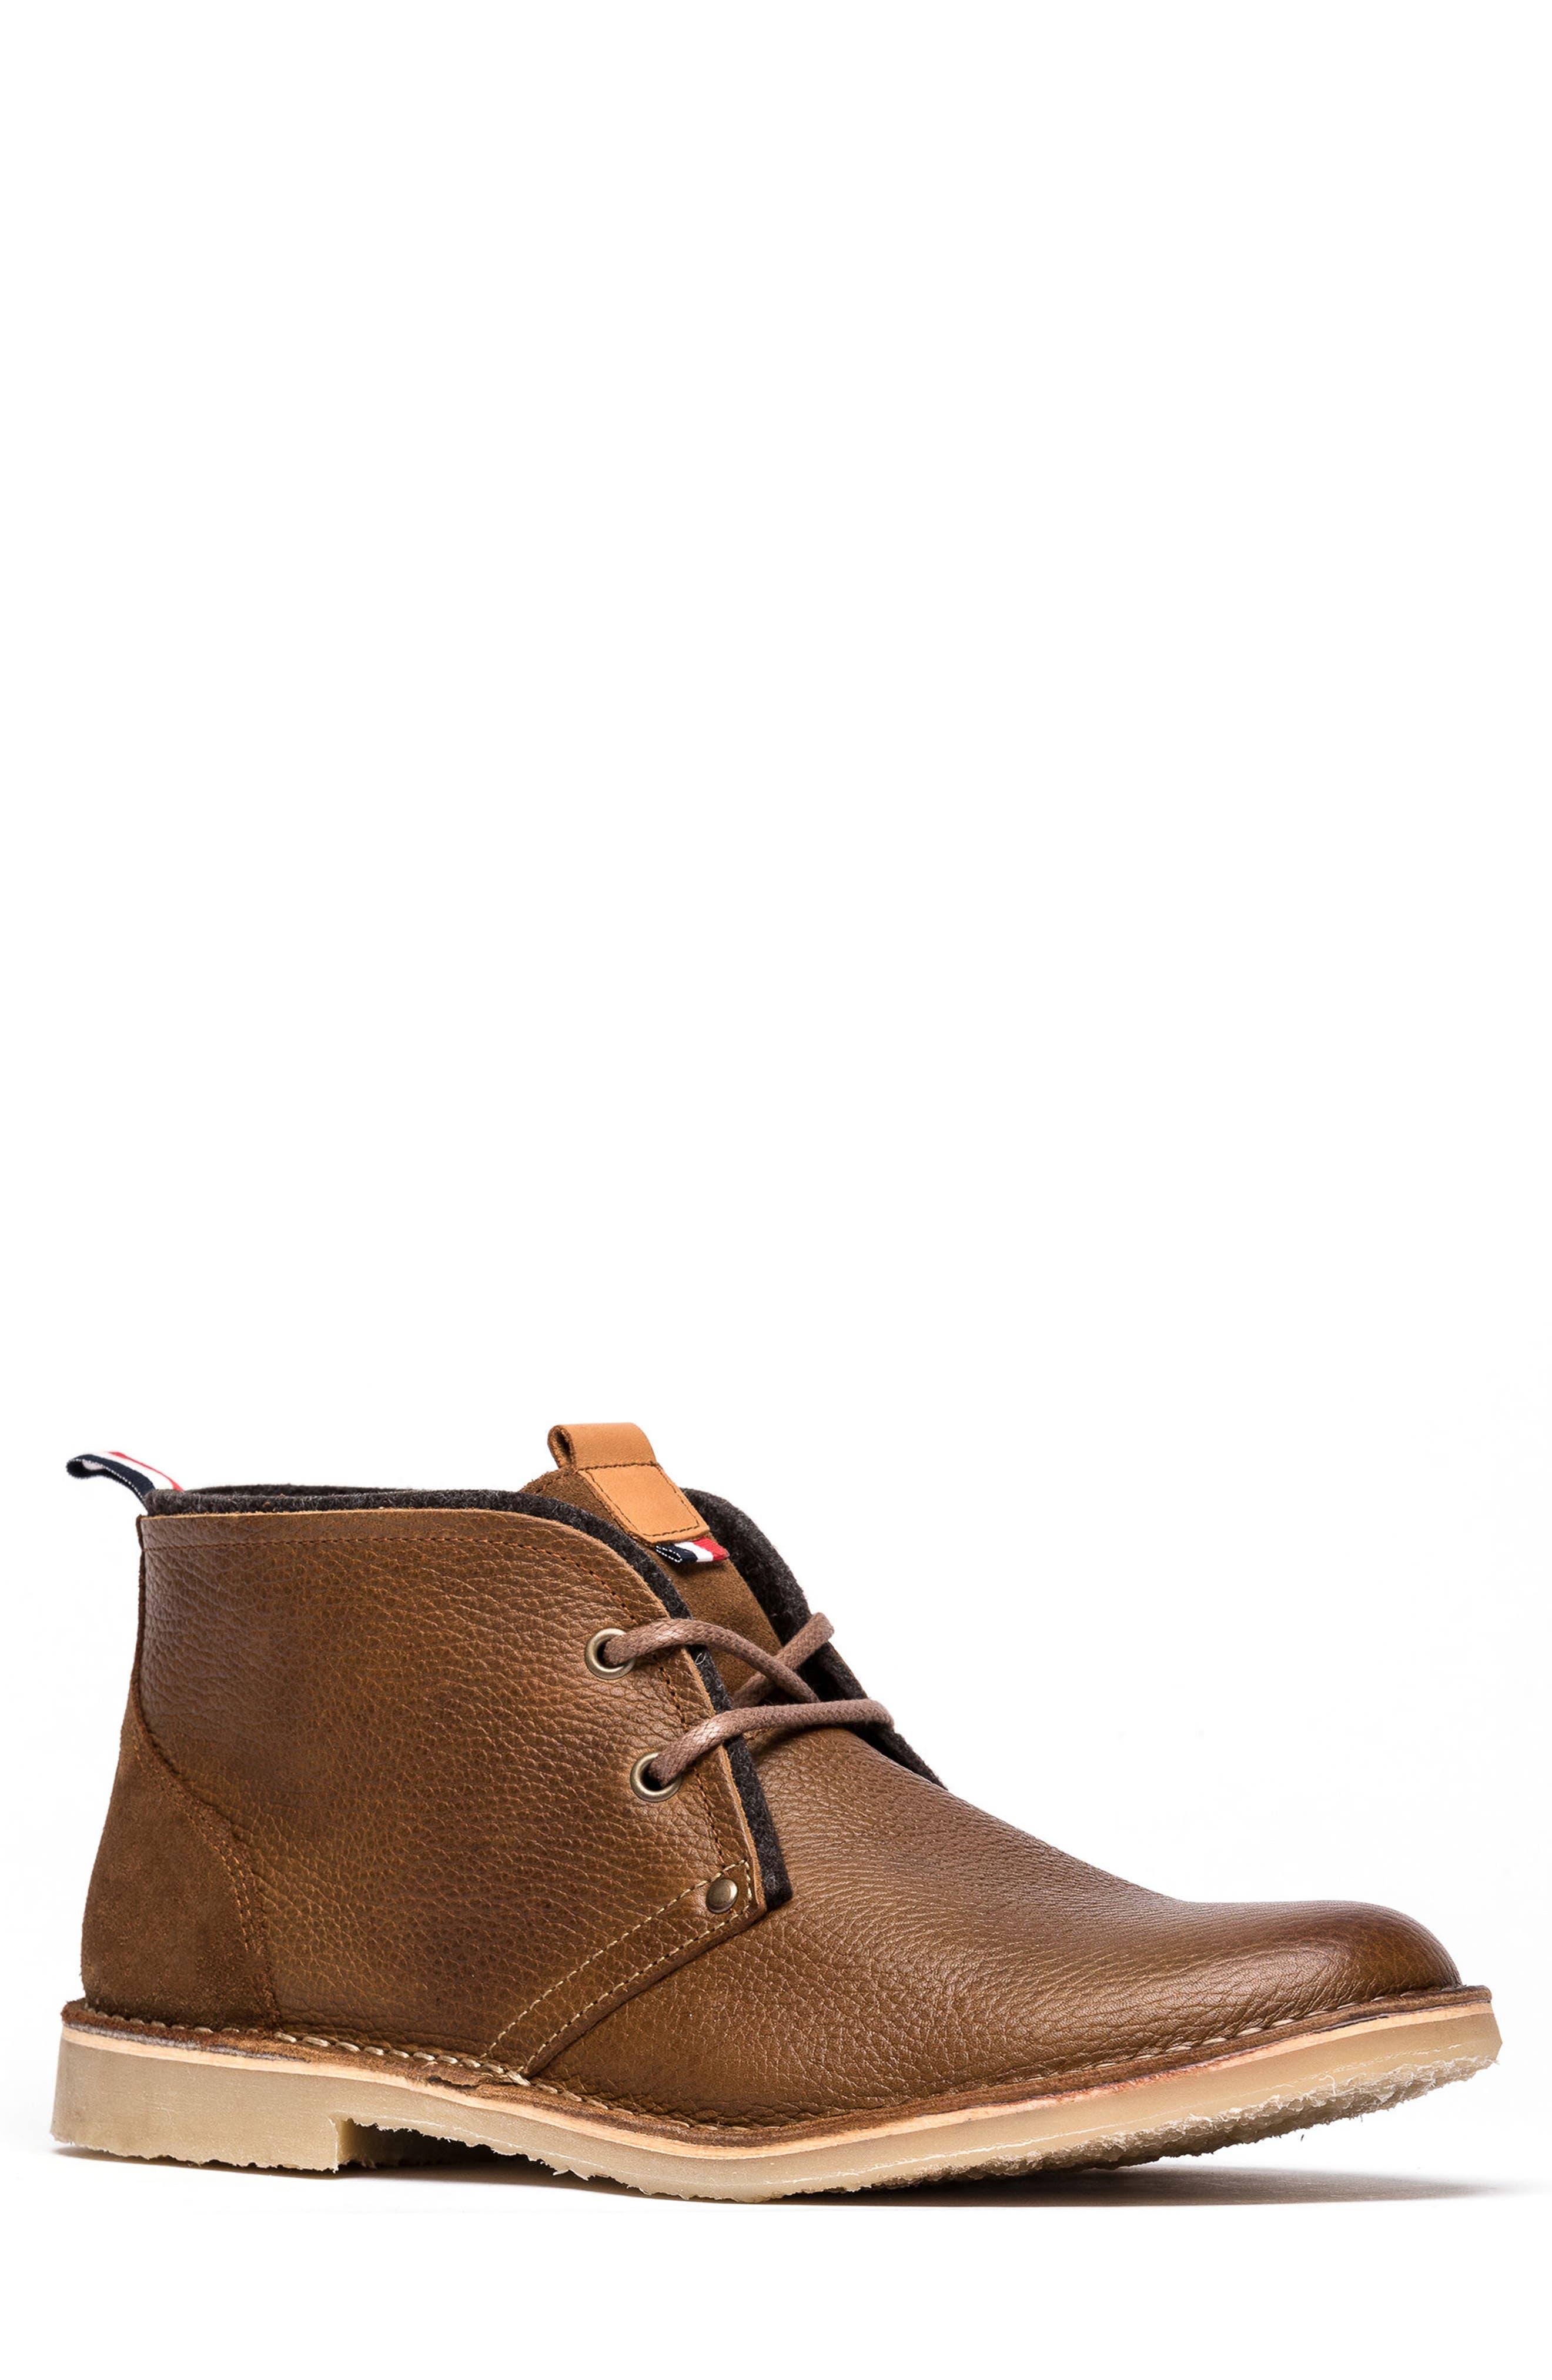 Drury Chukka Boot,                         Main,                         color, Tobacco